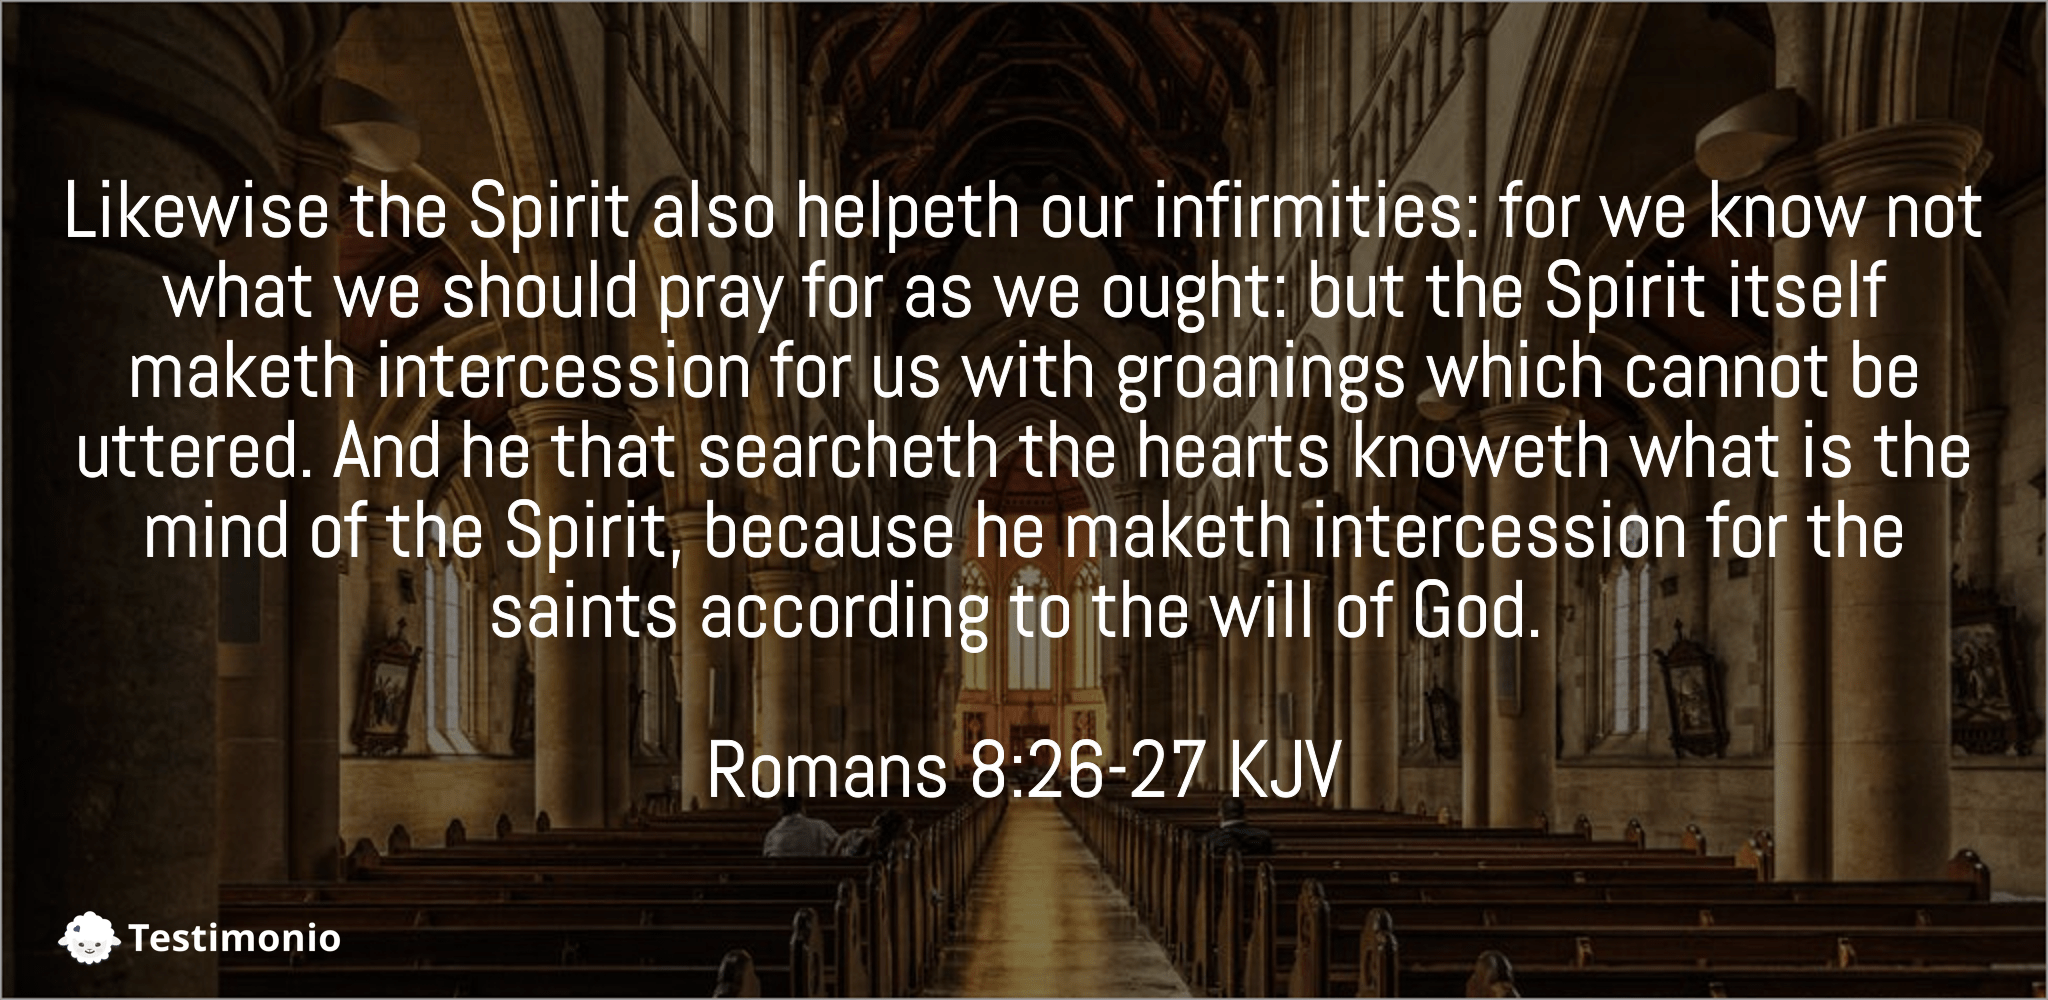 Romans 8:26-27